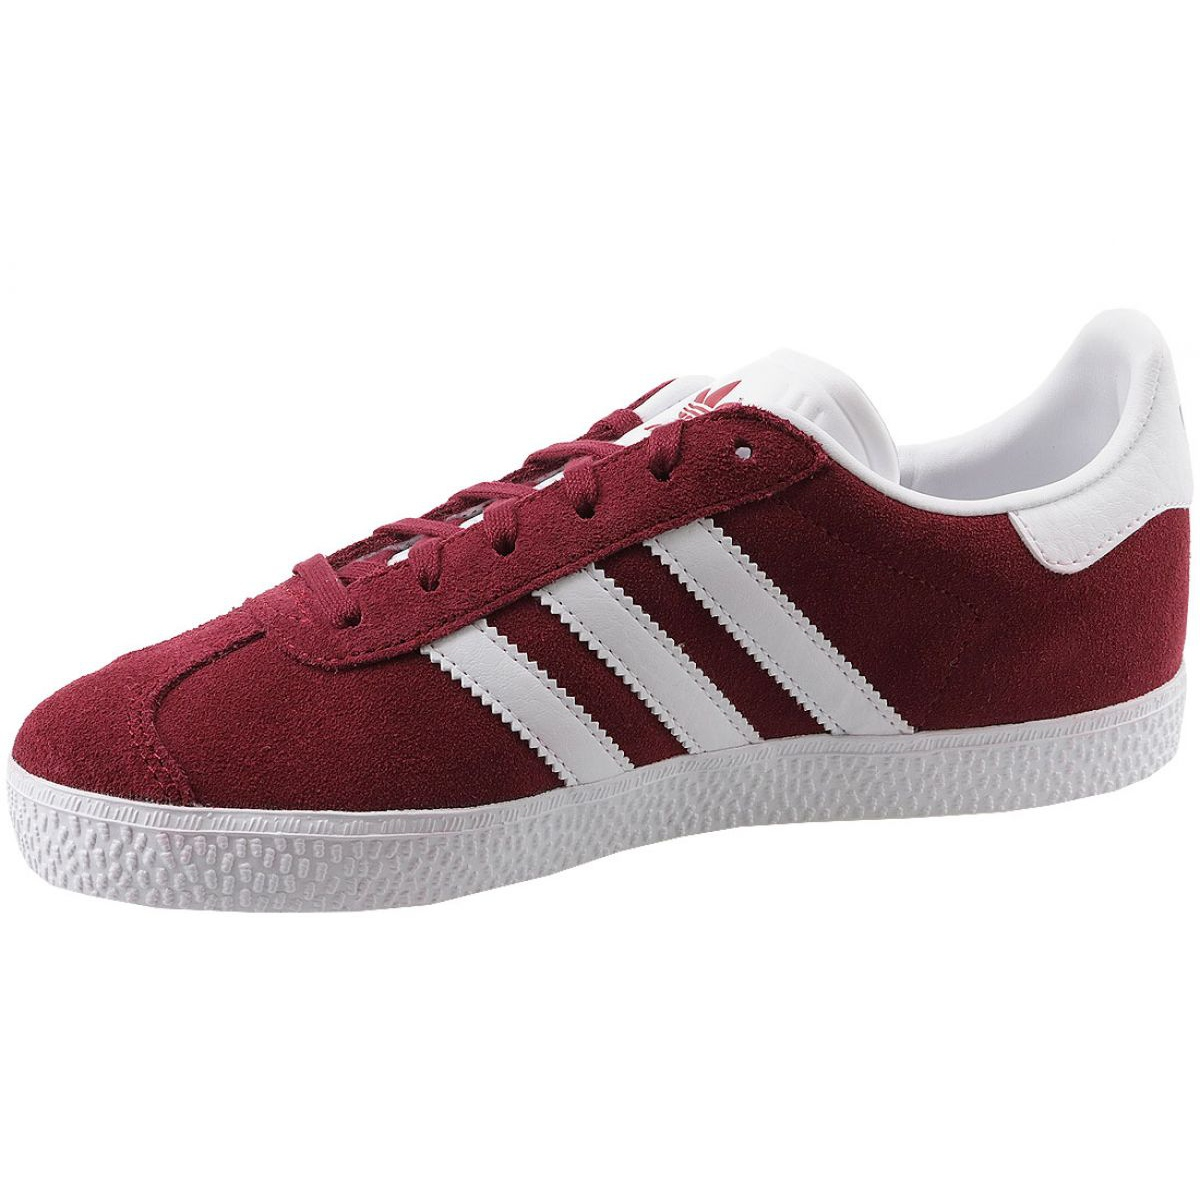 860490209 Adidas Gazelle Jr CQ2874 røde sko